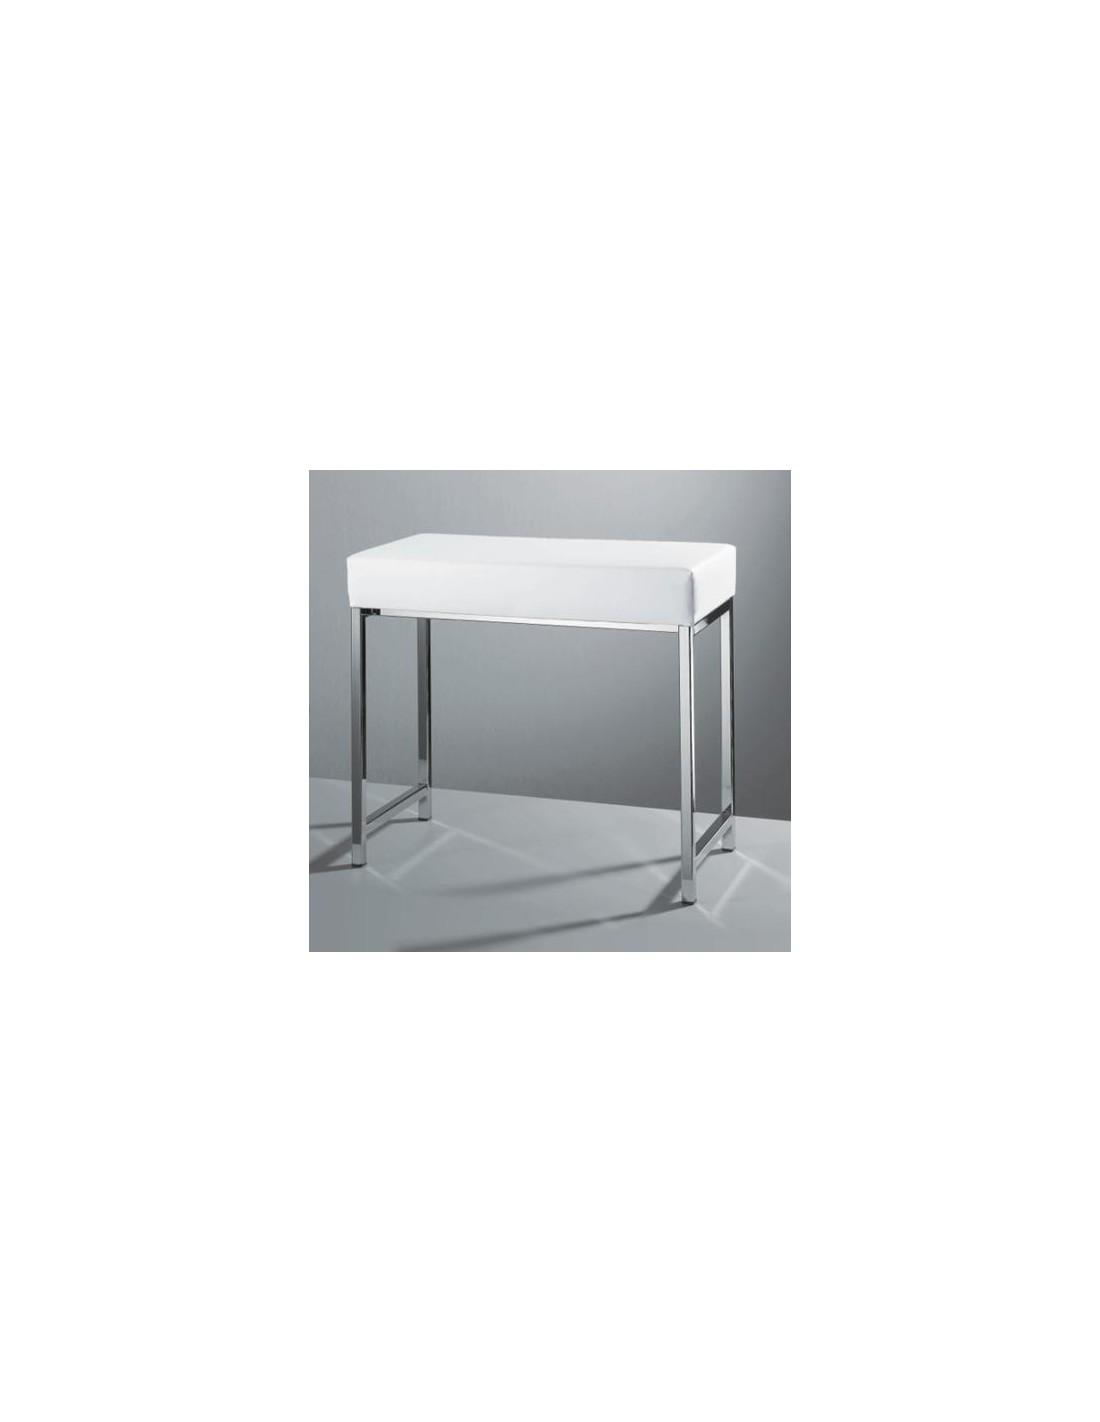 Banc rectangulaire blanc Decor Walther